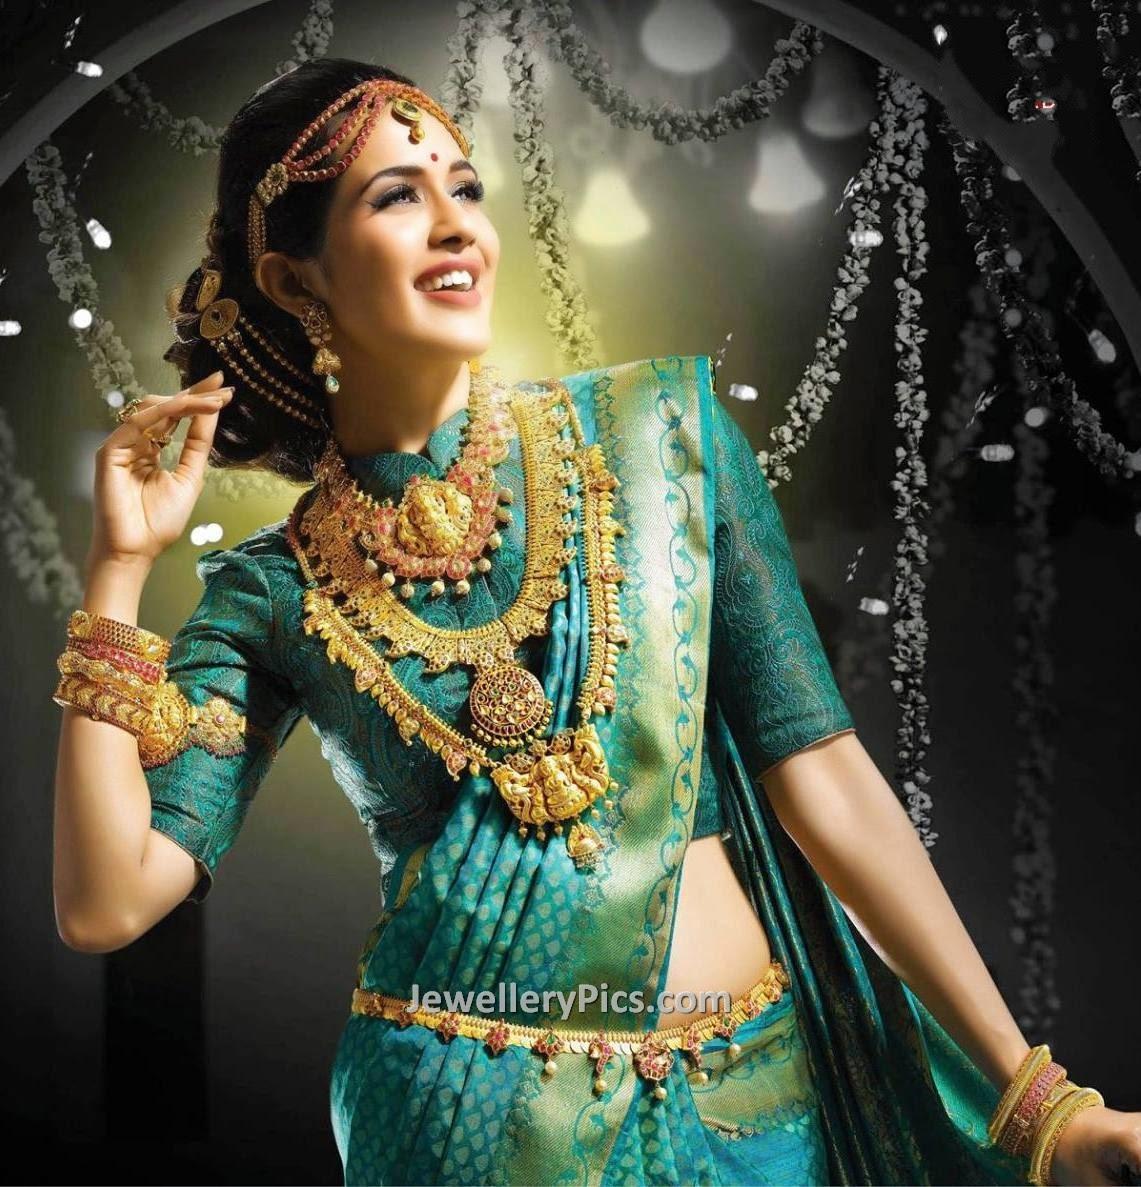 jewellery design pictures: Bhima Antique bridal jewellery